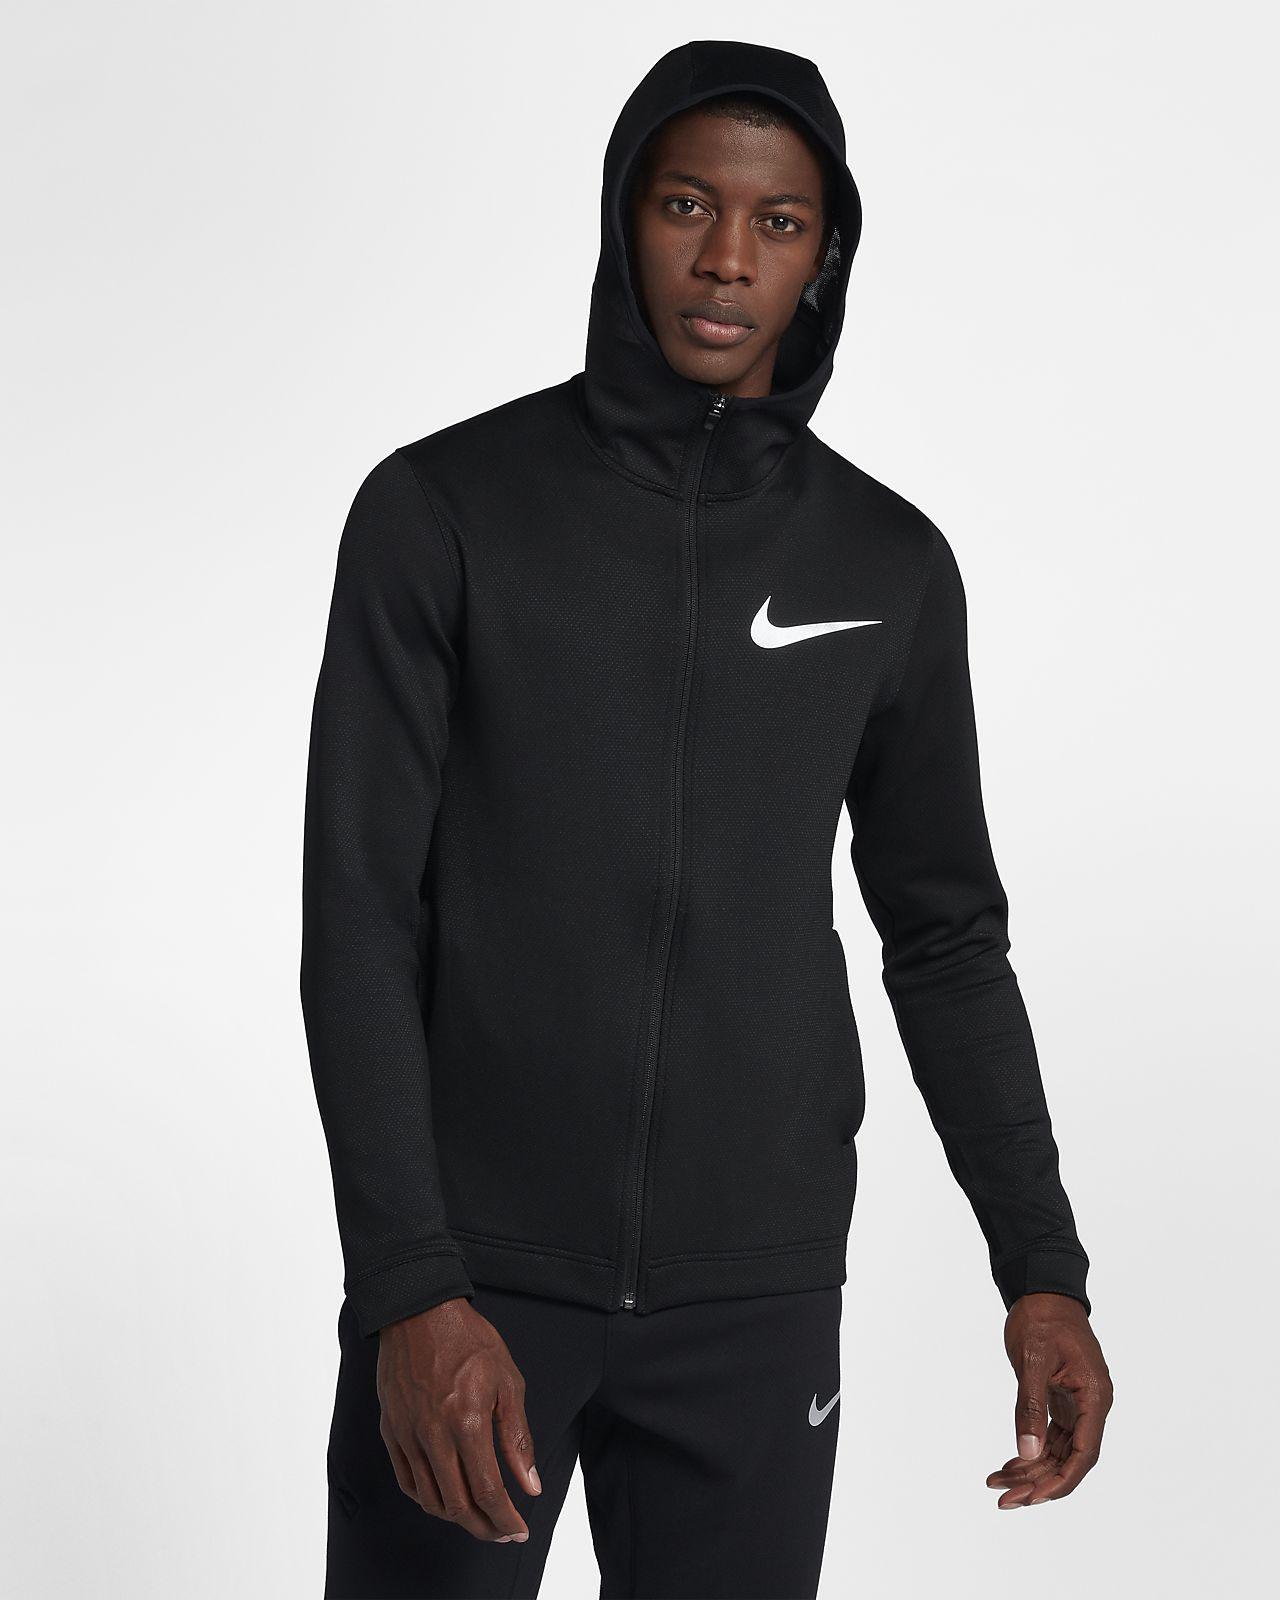 Nike Therma Flex Showtime Men's Full Zip Basketball Hoodie